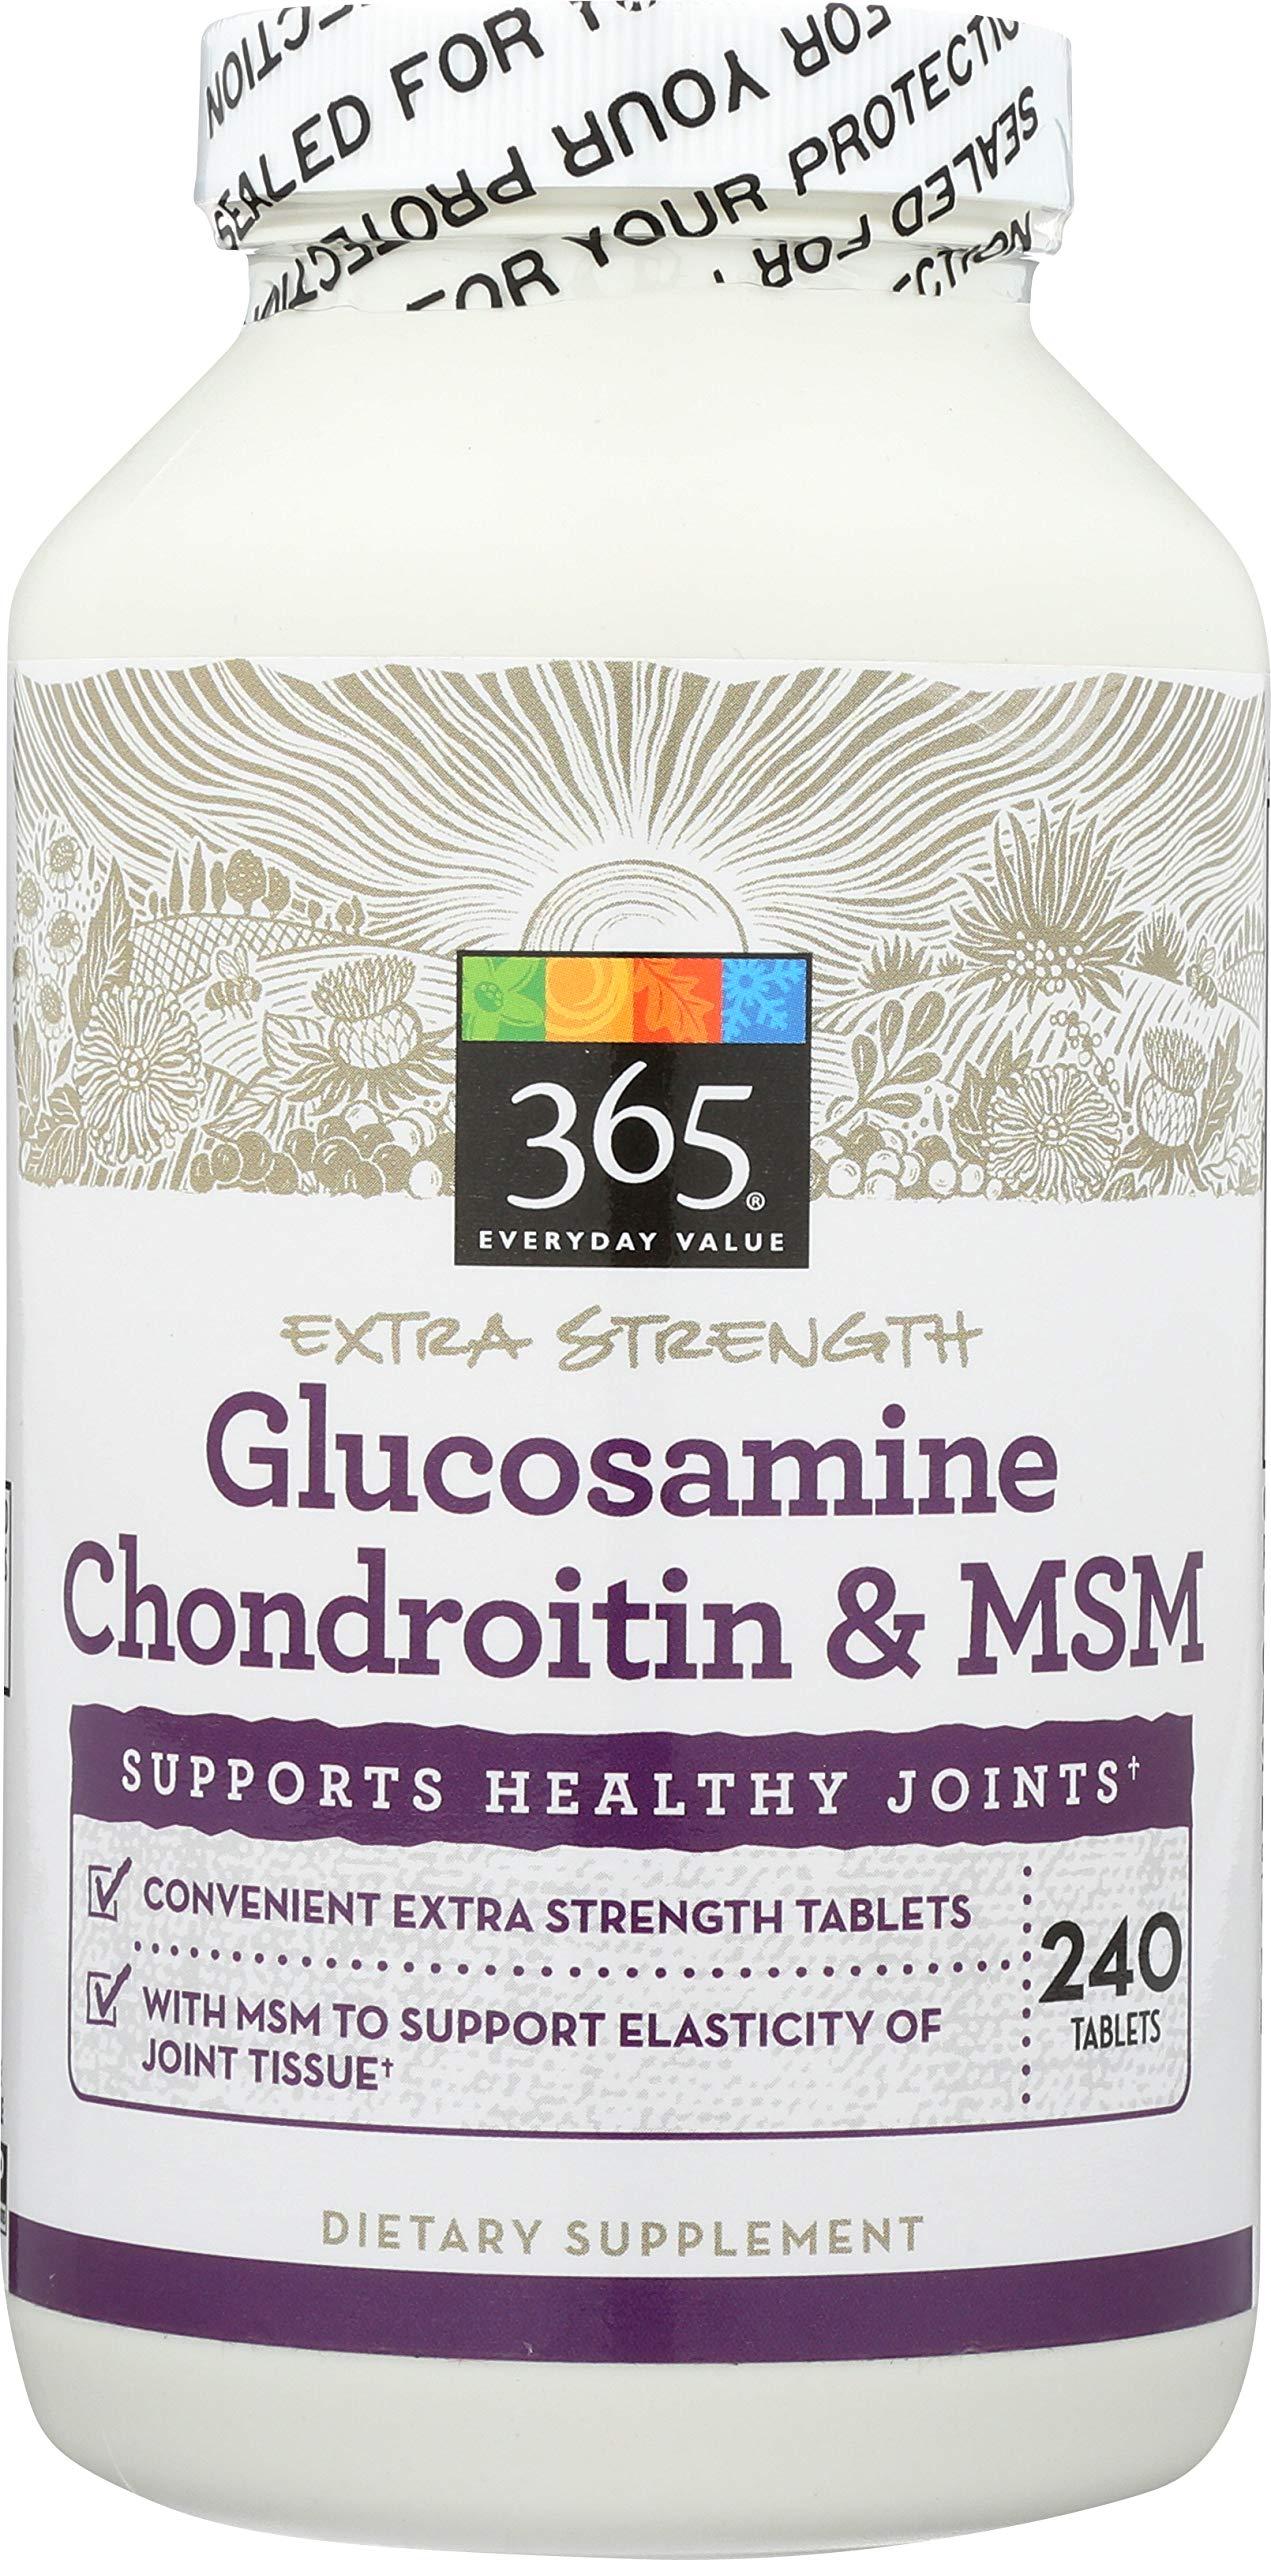 365 Everyday Value, Glucosamine Chondriotin & MSM, 240 ct by 365 Everyday Value